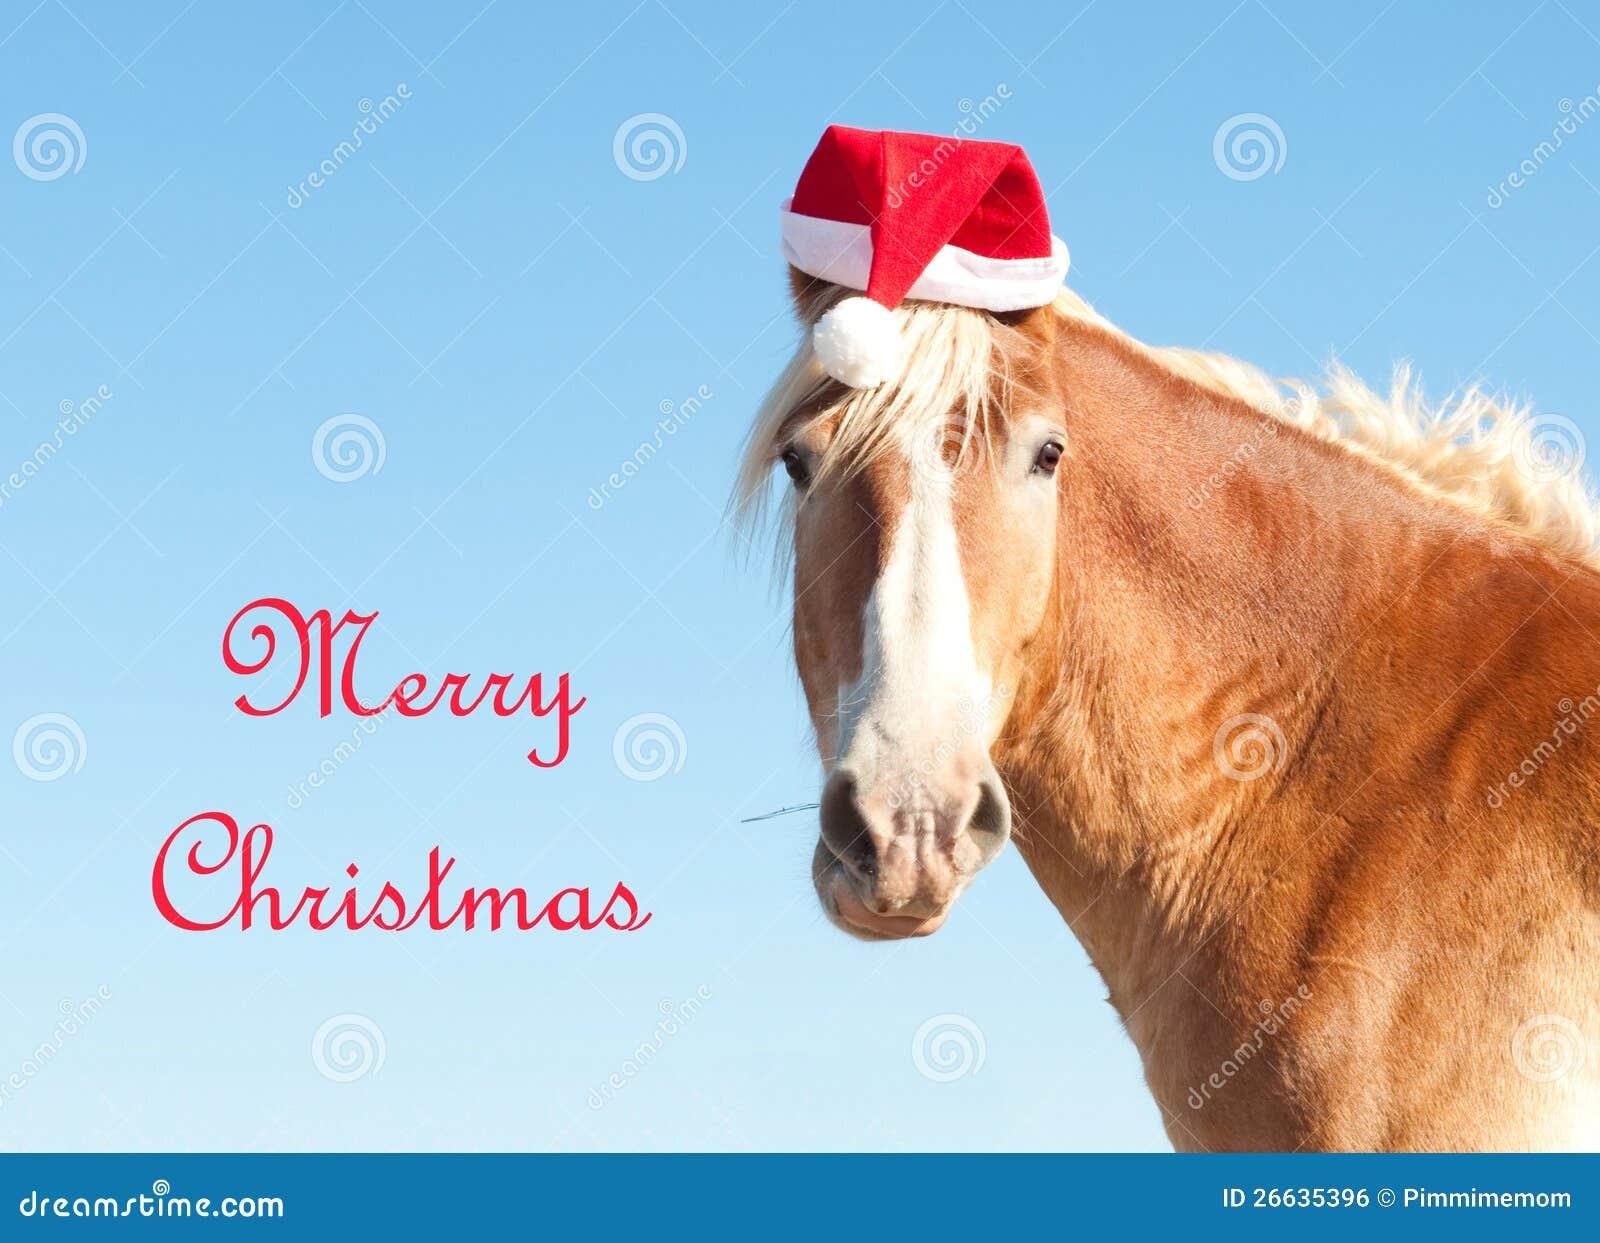 Belgian Draft Horse Wishing Merry Christmas Royalty Free Stock ...